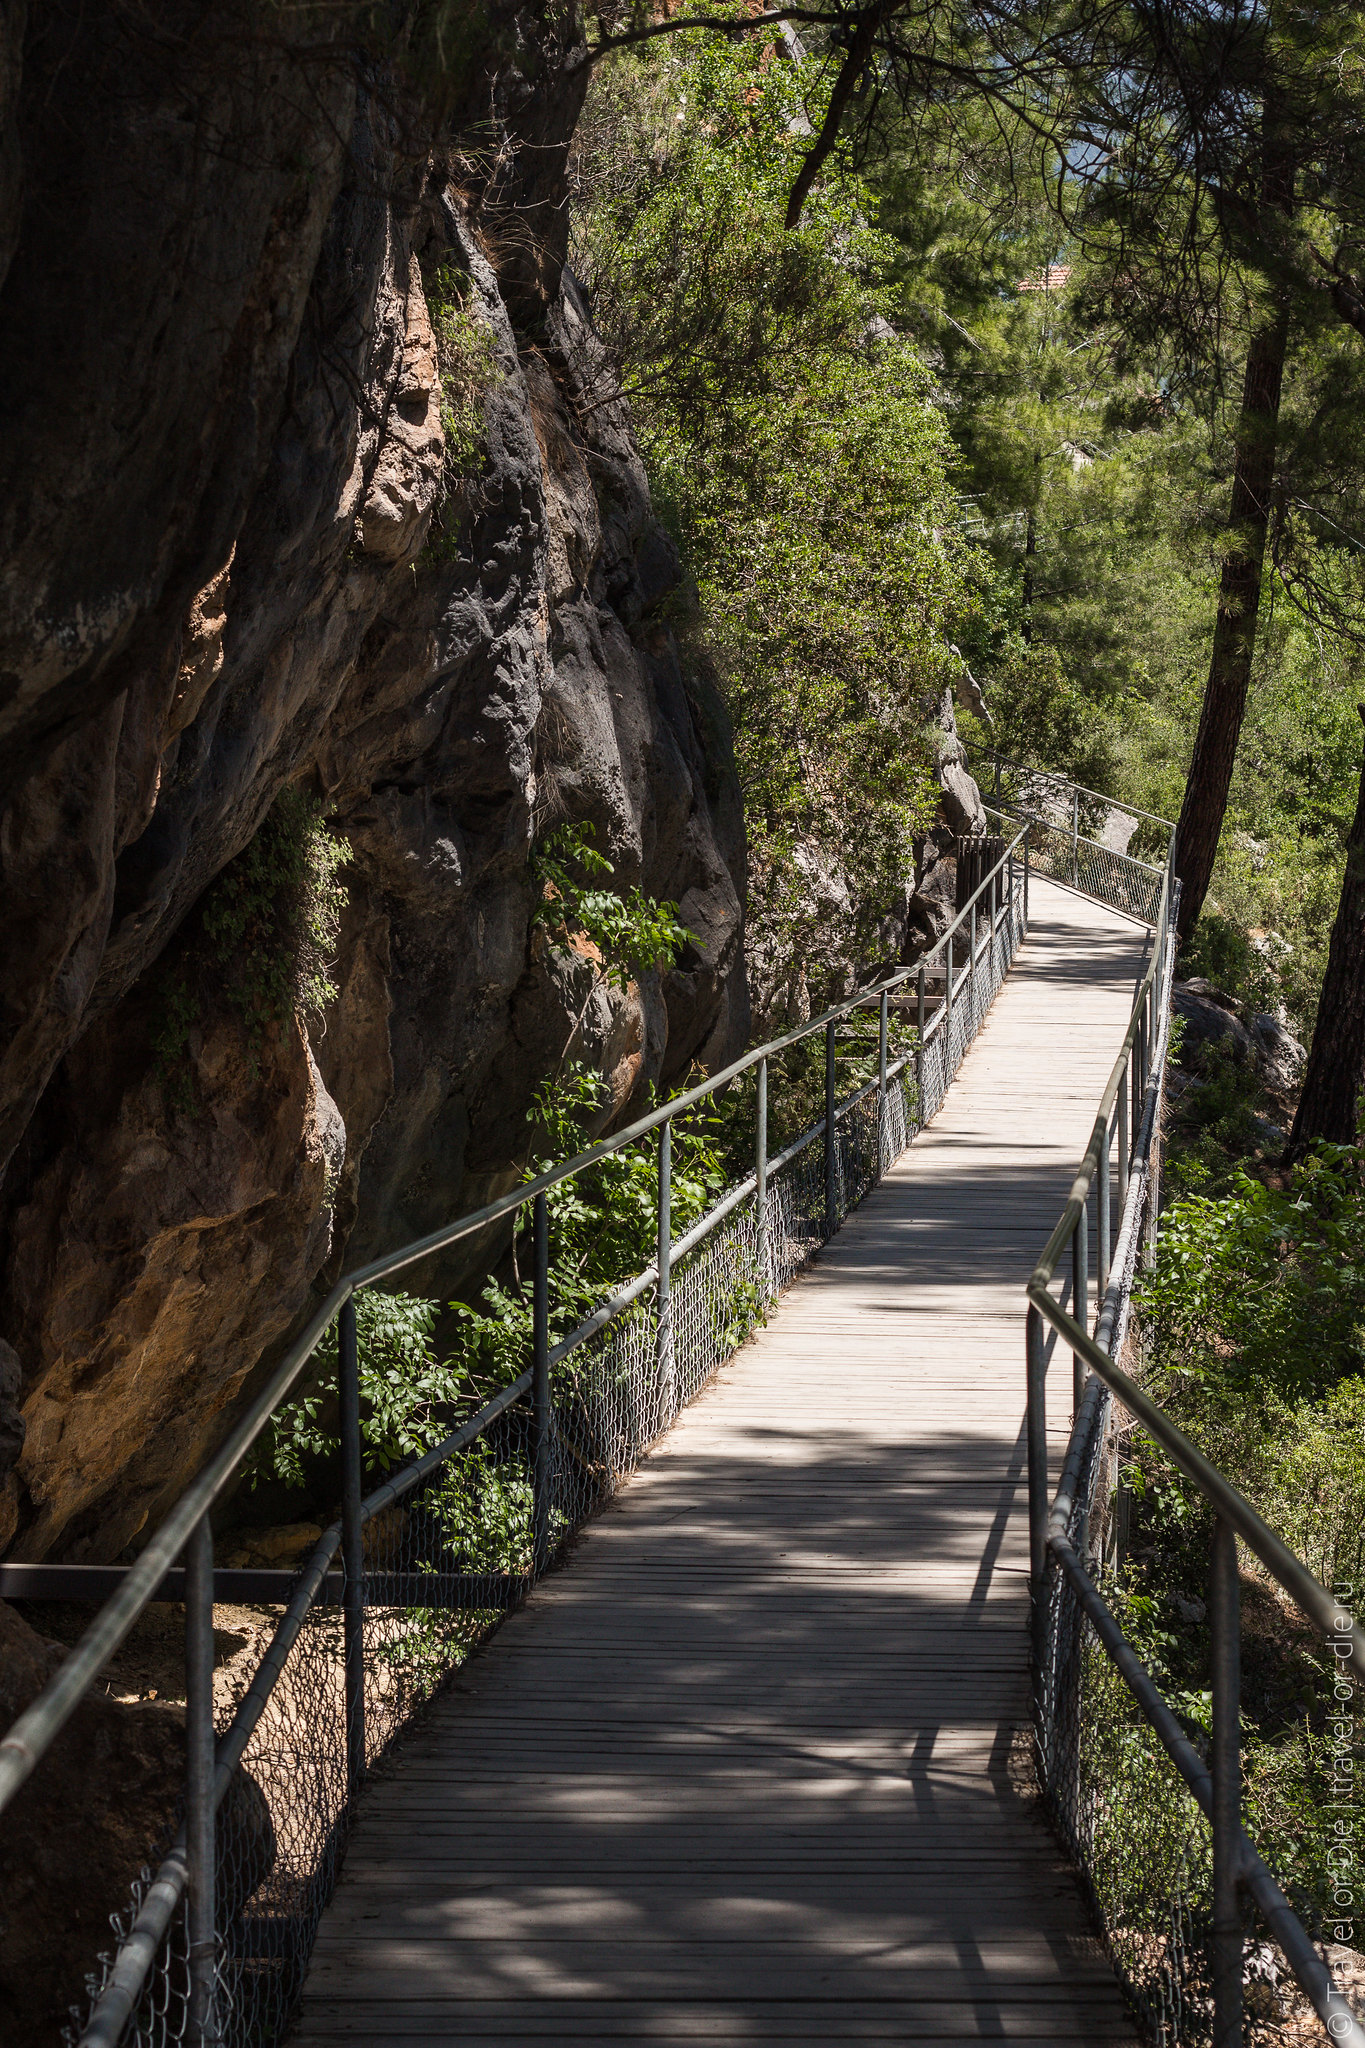 Sapadere-Canyon-Tour-экскурсия-в-каньон-сападере-6230